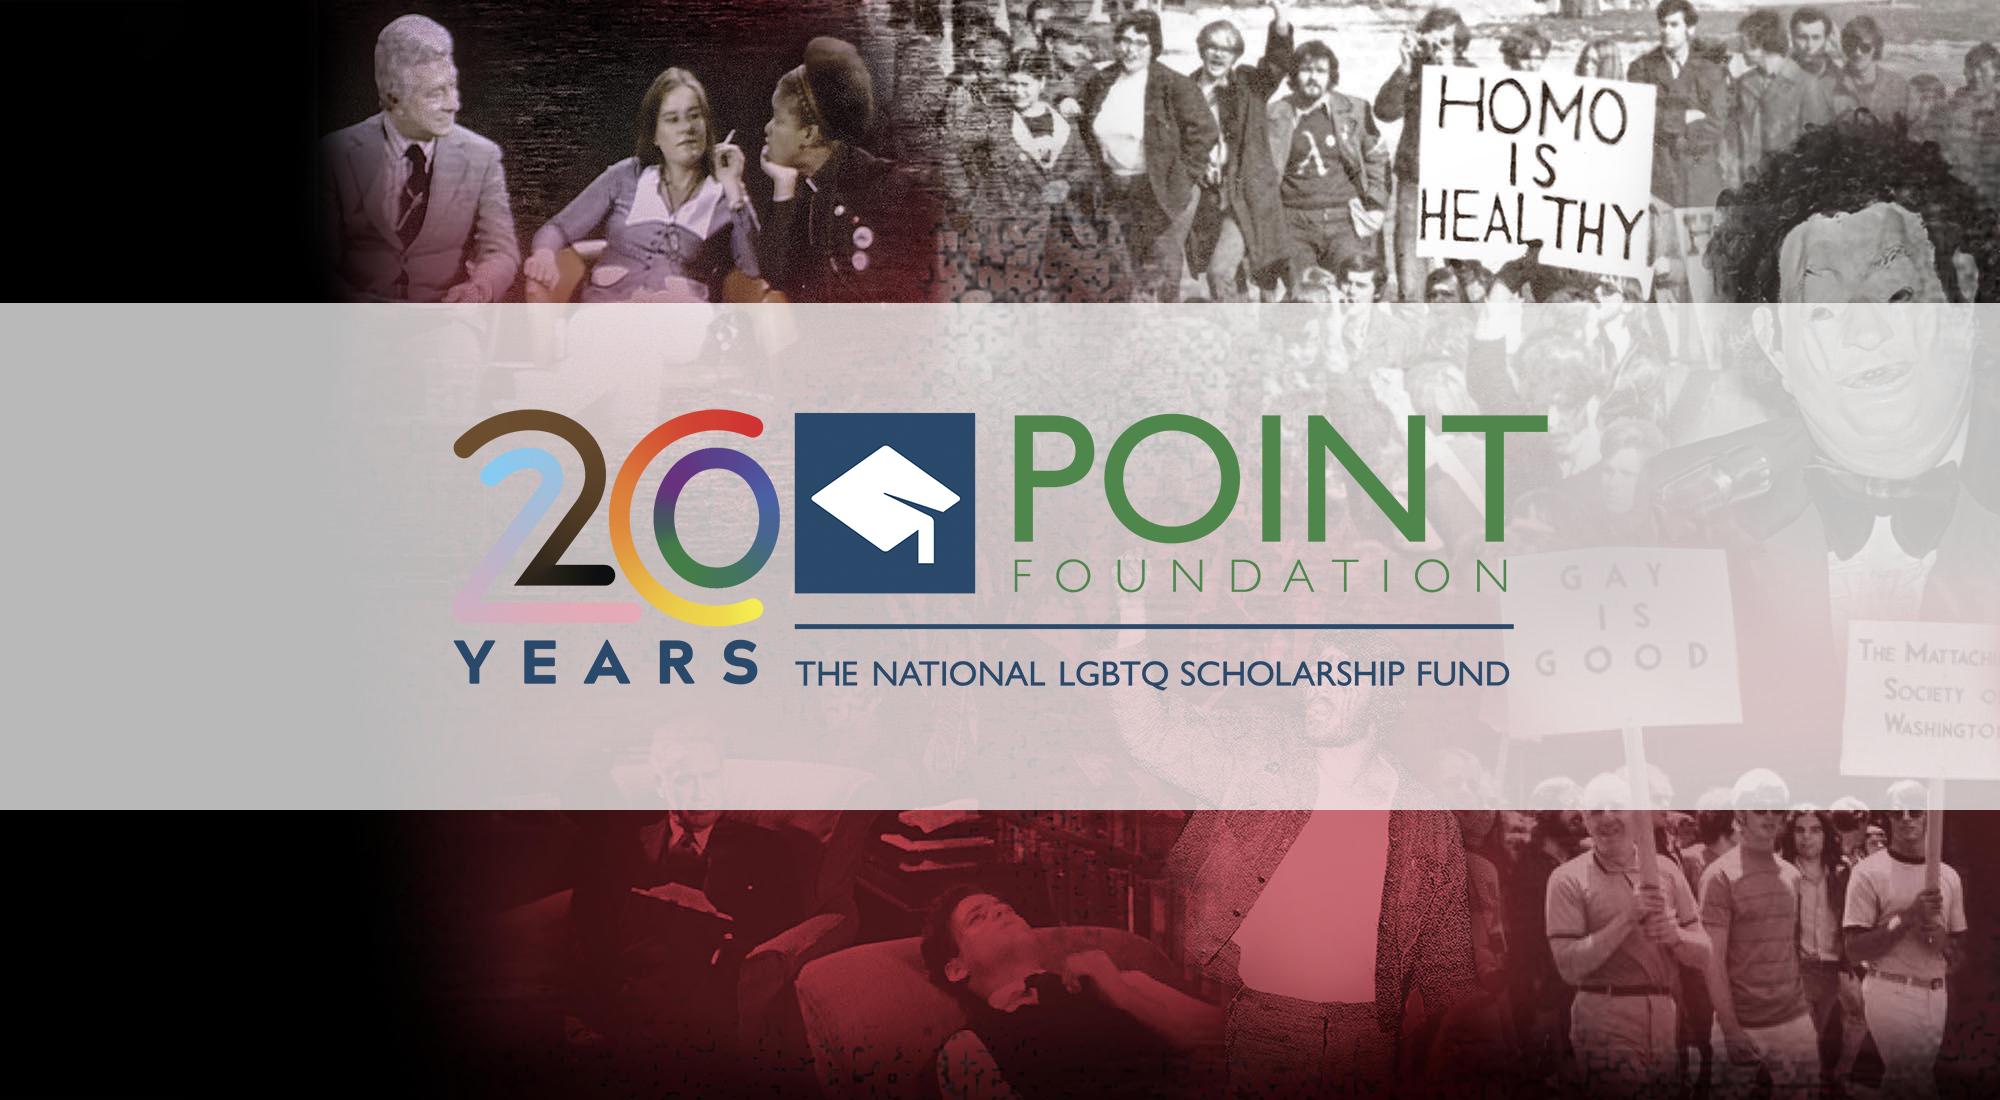 Celebrating 20 years of Point Foundation